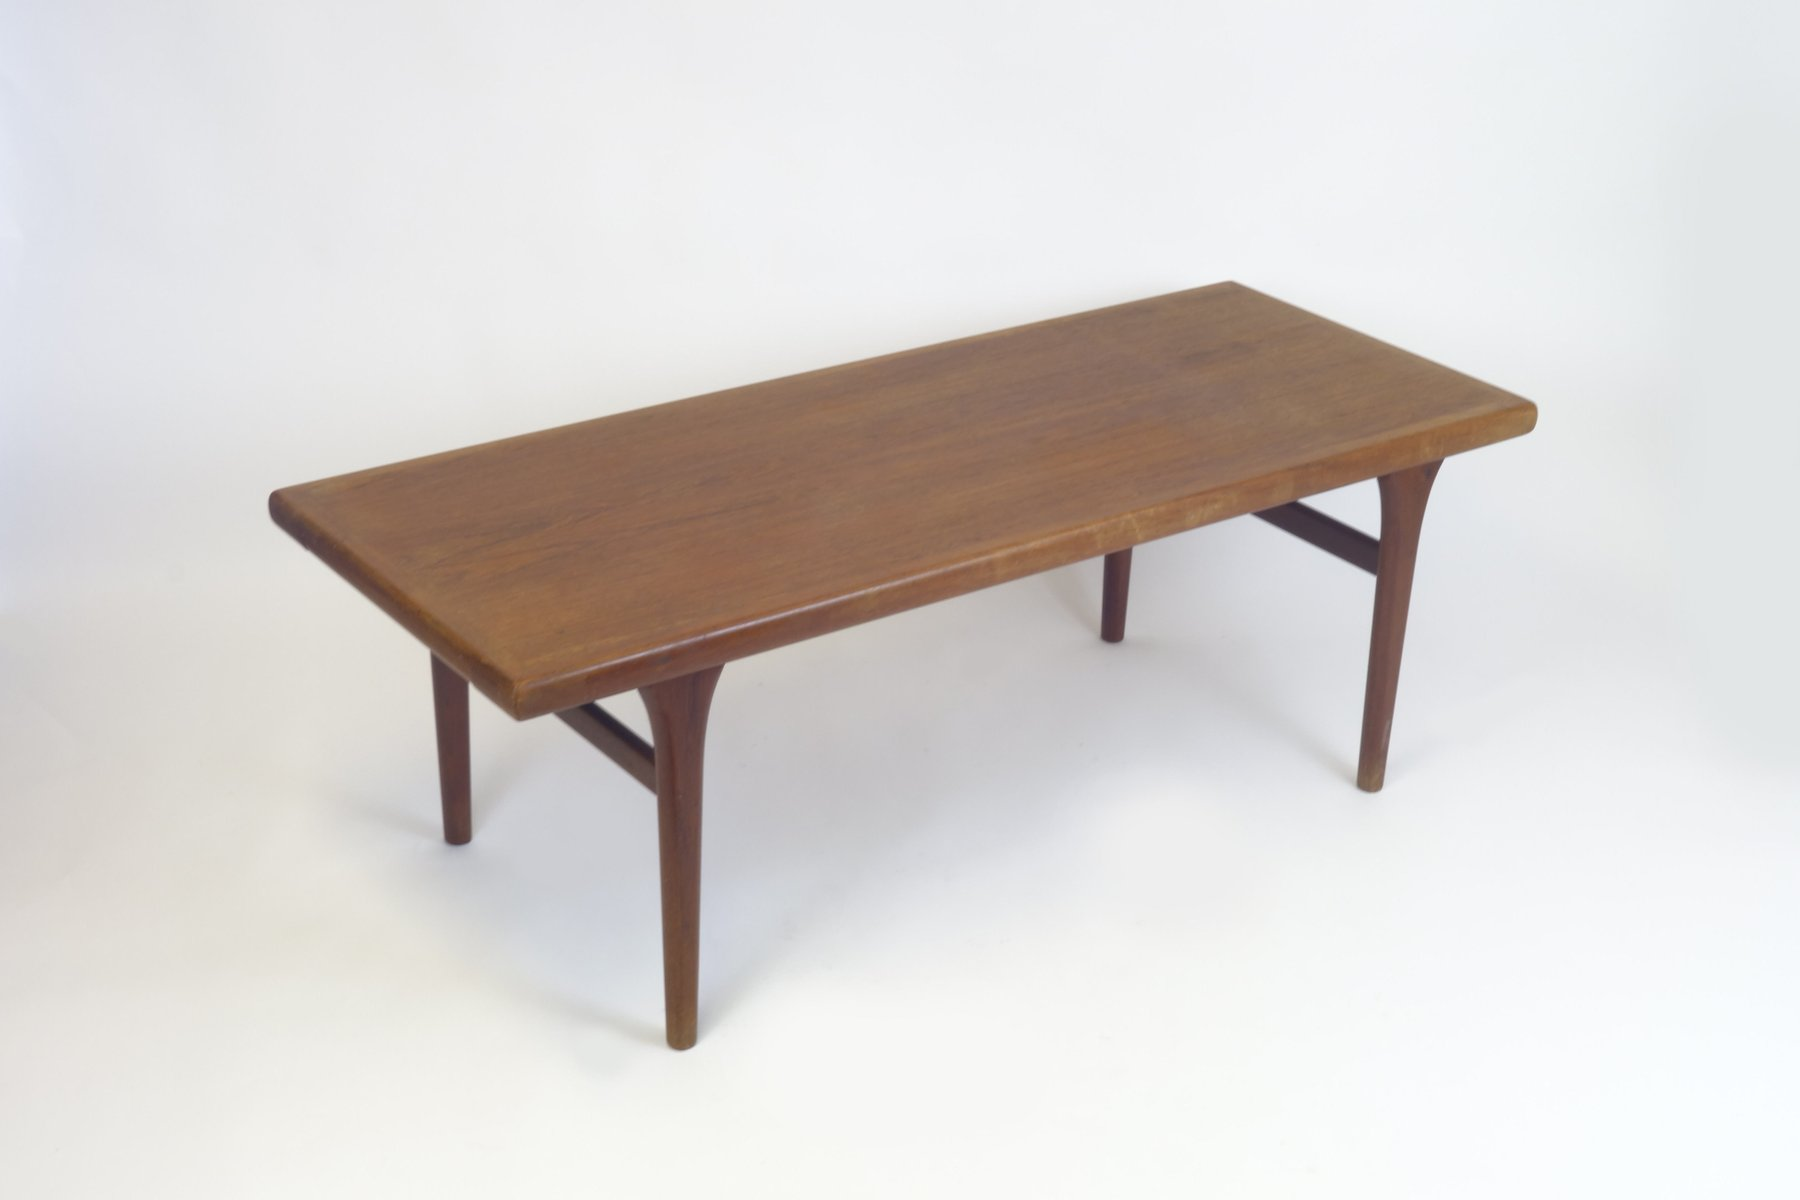 Elegant Mid Century Danish Teak Side Table By Johannes Andersen For PBS